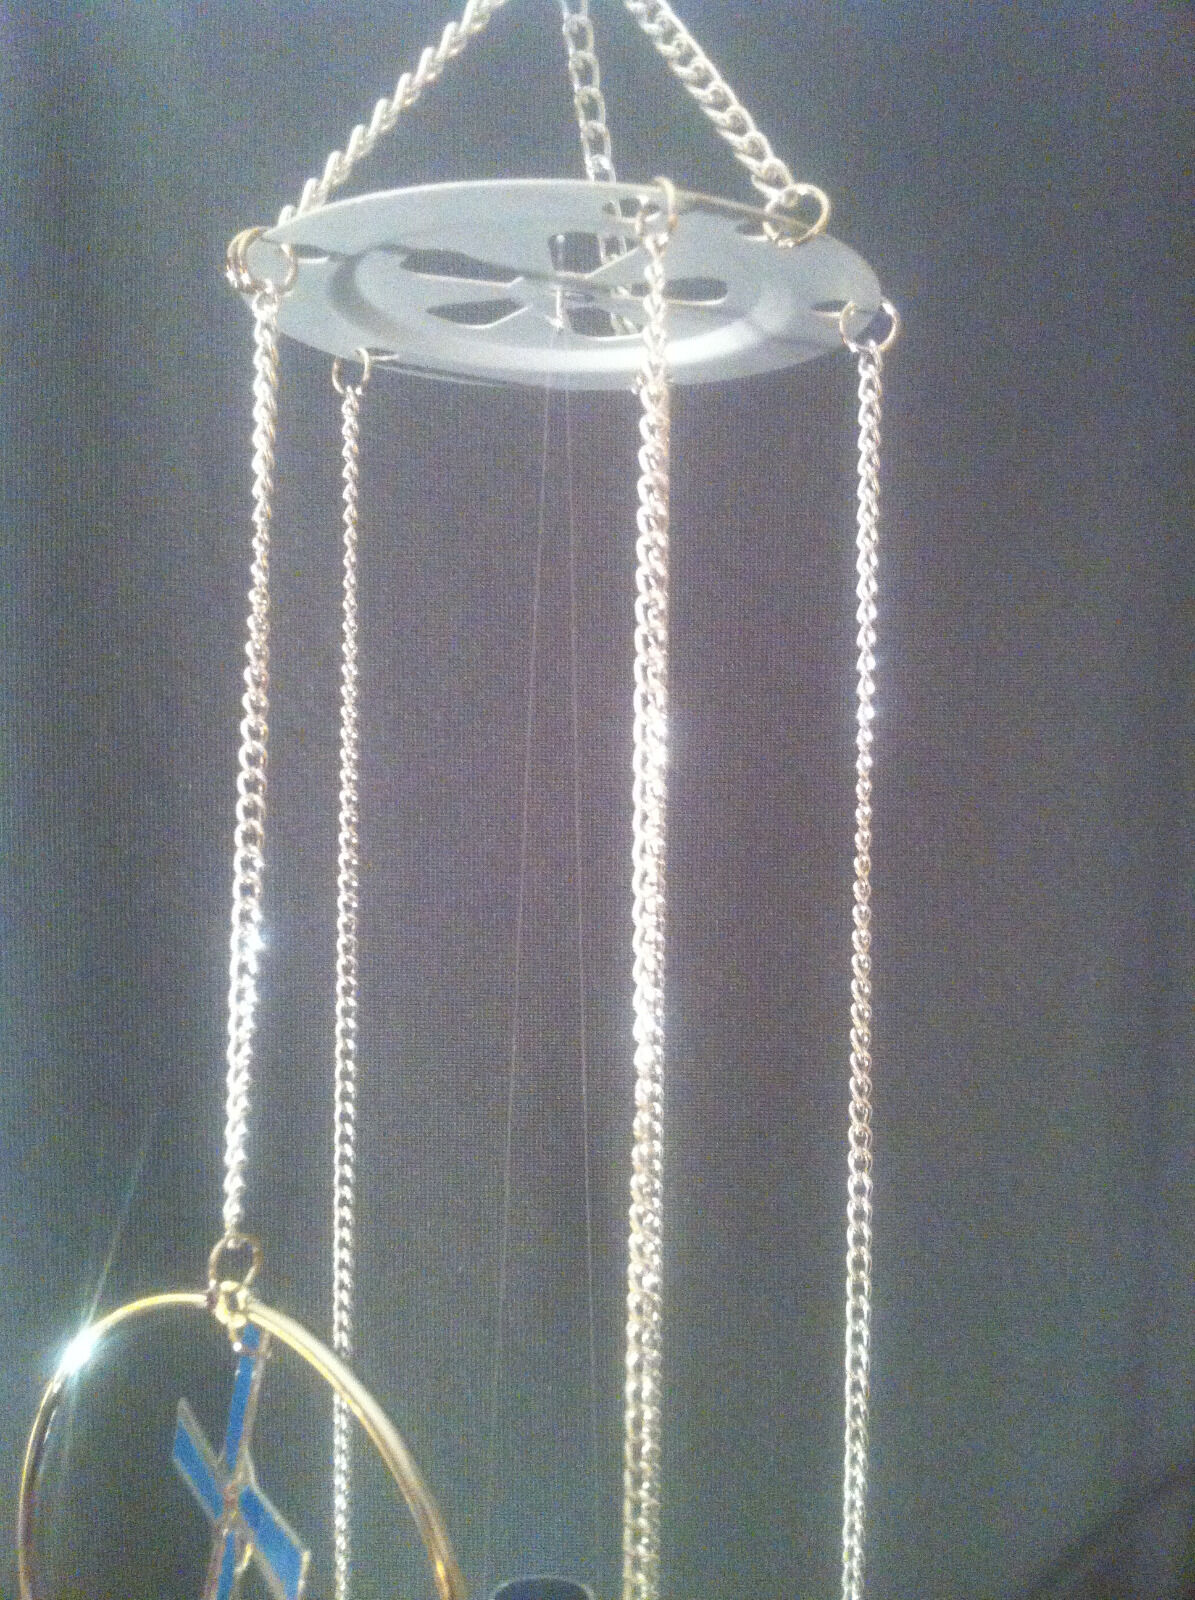 Cadona 5-Ring Aluminum Decorative Multicolor Windmill Wind Chime